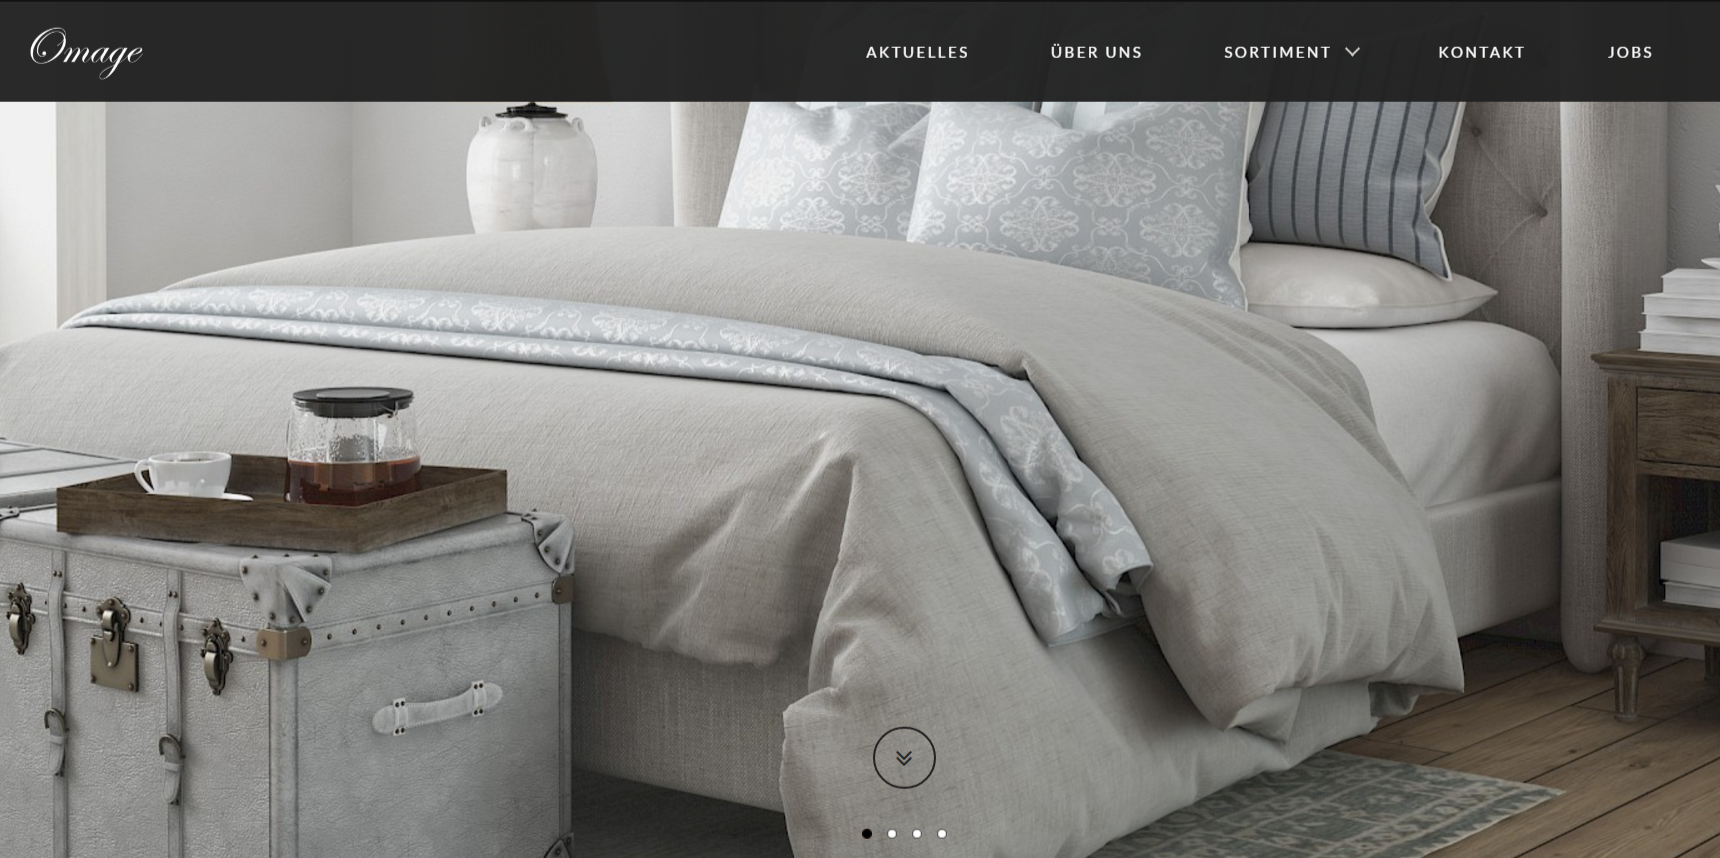 omage schoenes wohnen immobilien leitner ihr. Black Bedroom Furniture Sets. Home Design Ideas